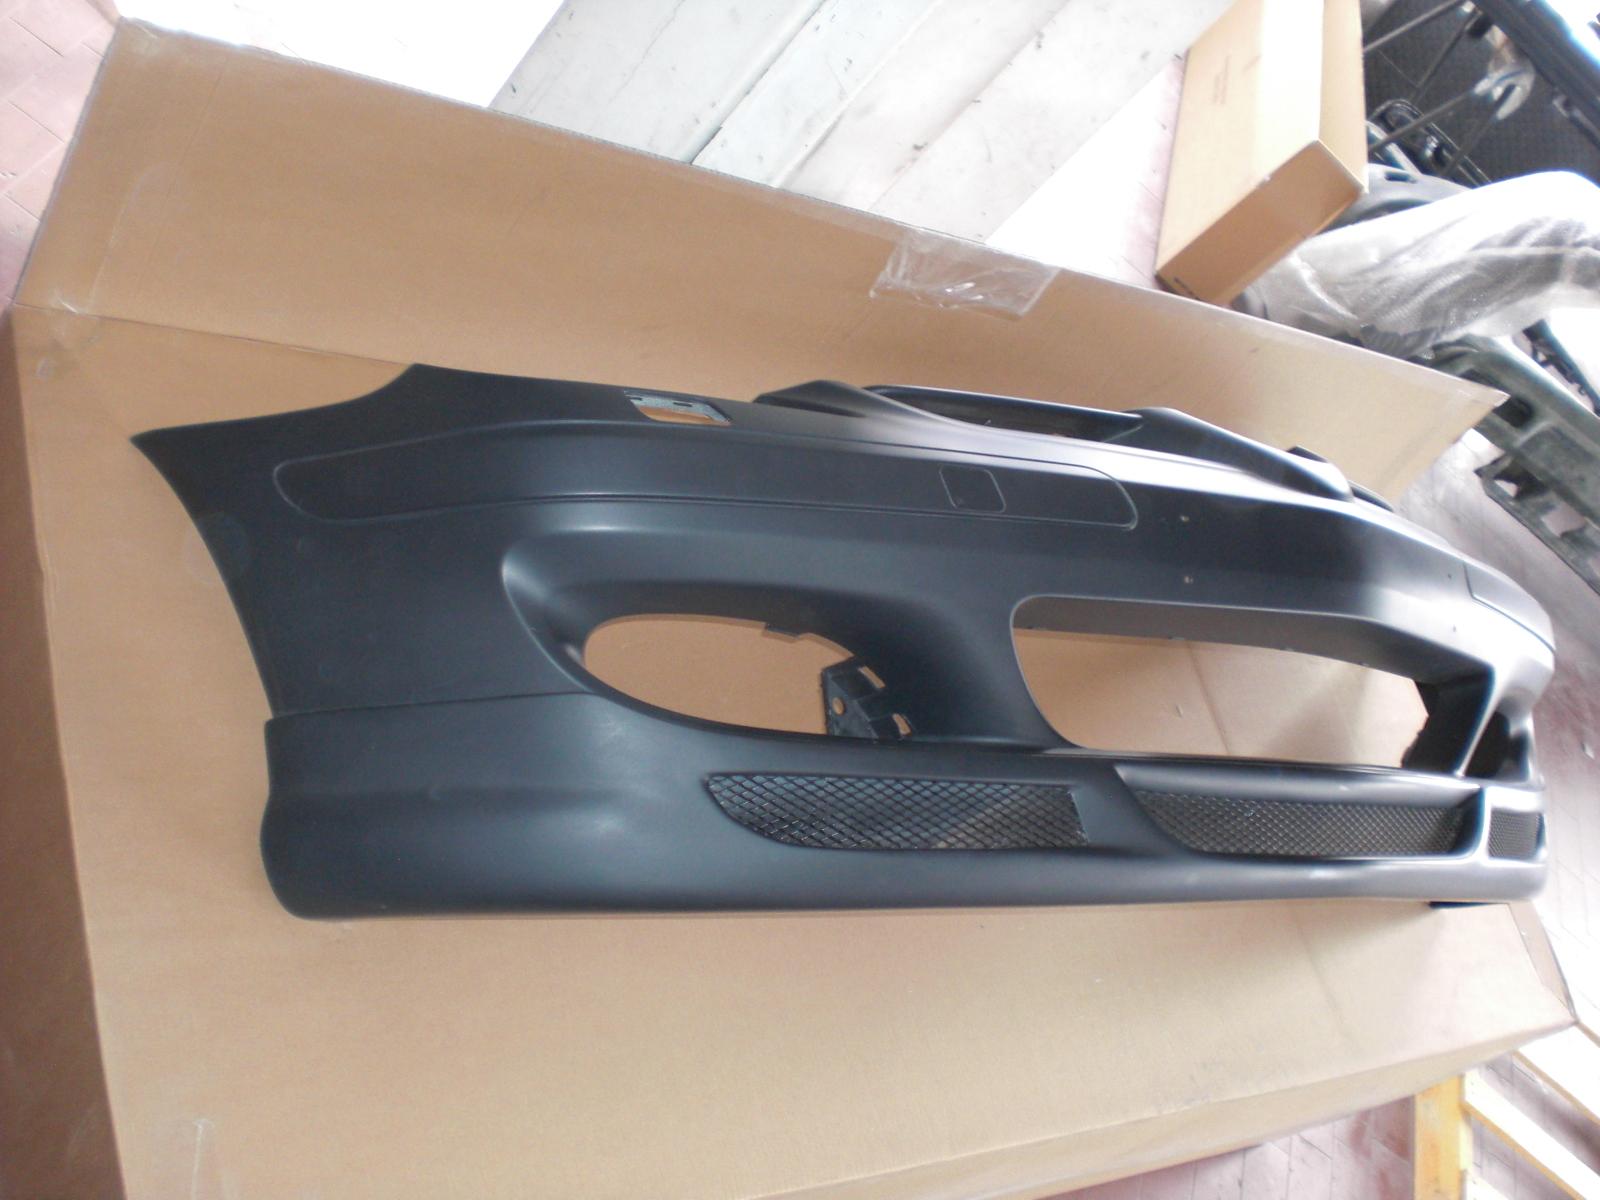 SLK R171 Frontspoiler Bausatz wide body dezent Göckel Automobilveredelung Styling Tuning Mercedes Benz